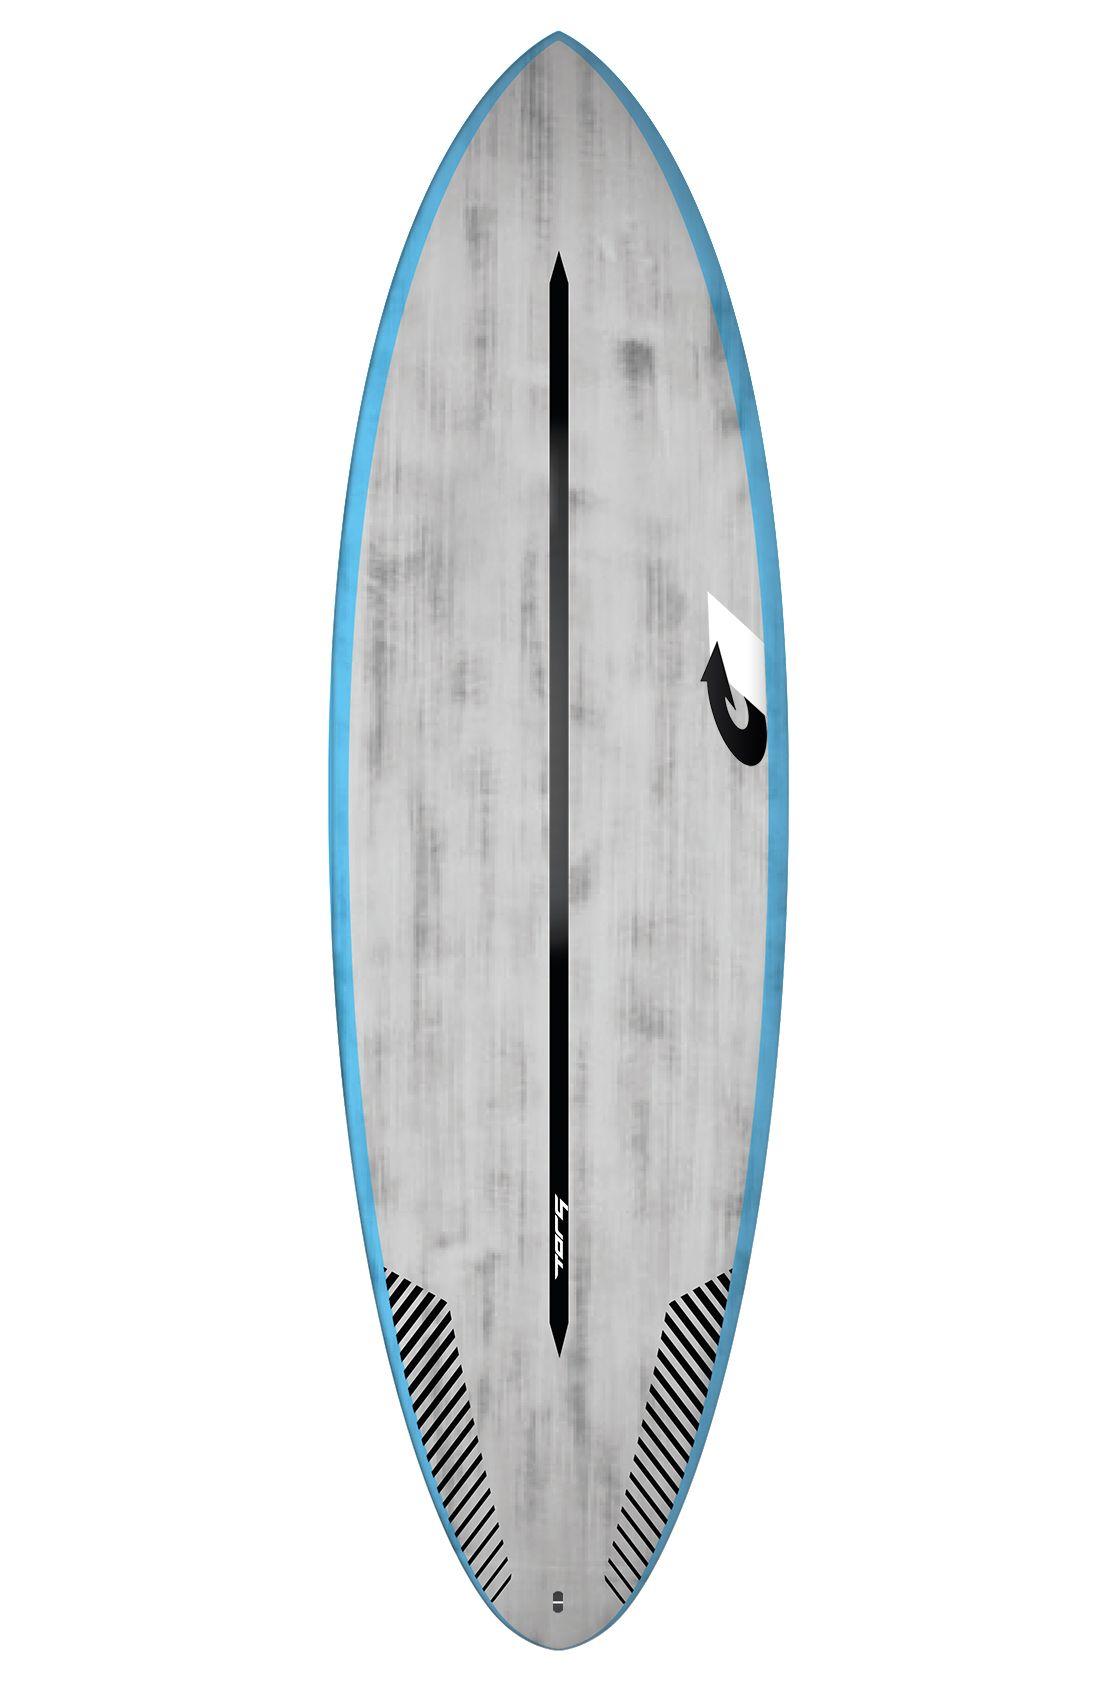 Prancha Surf Torq 7'2 BIGBOY 23 BLUE RAILS + BRUSHED GRAY Squash Tail - Color Futures Multisystem 7ft2